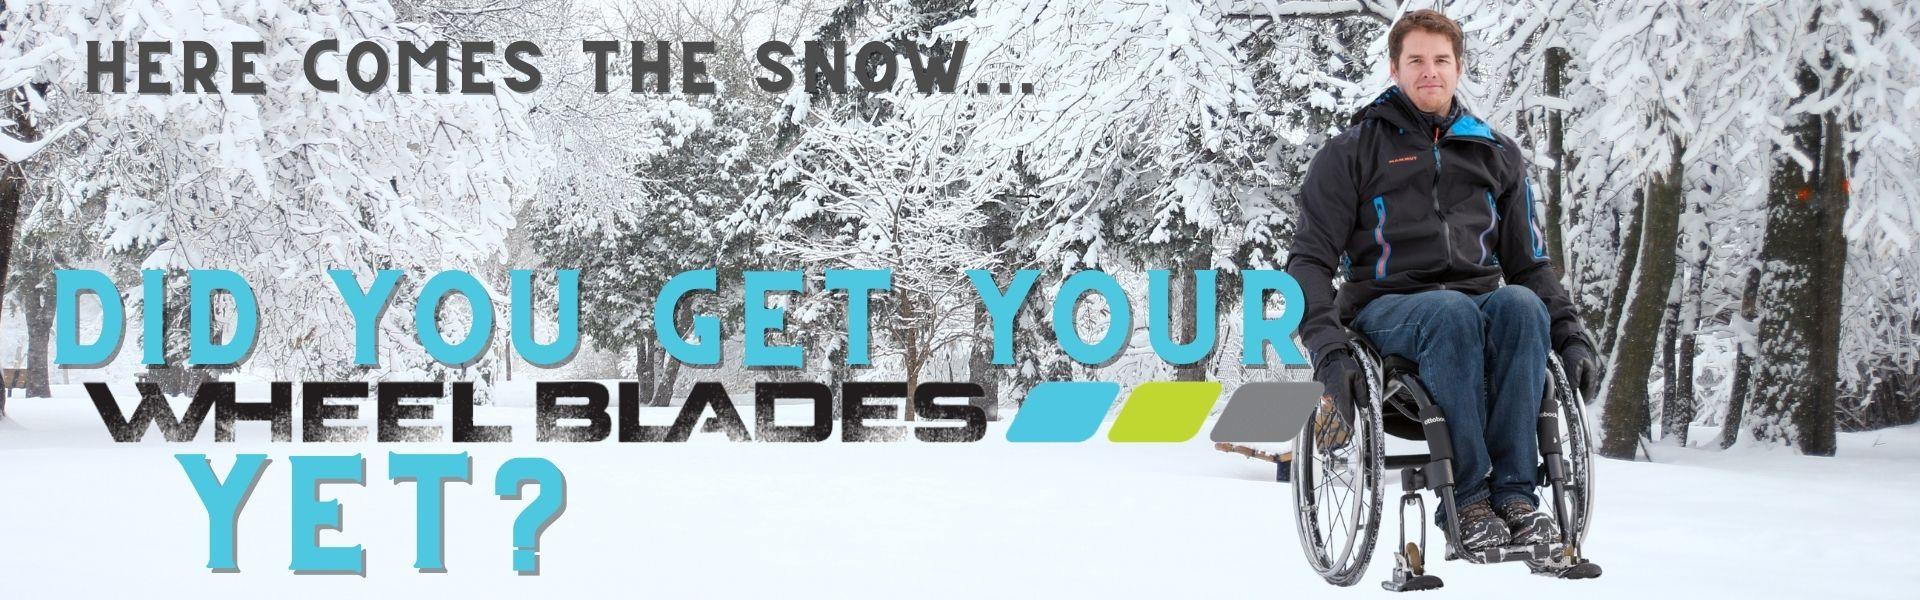 Wheel Blades snow and ice wheelchair skis